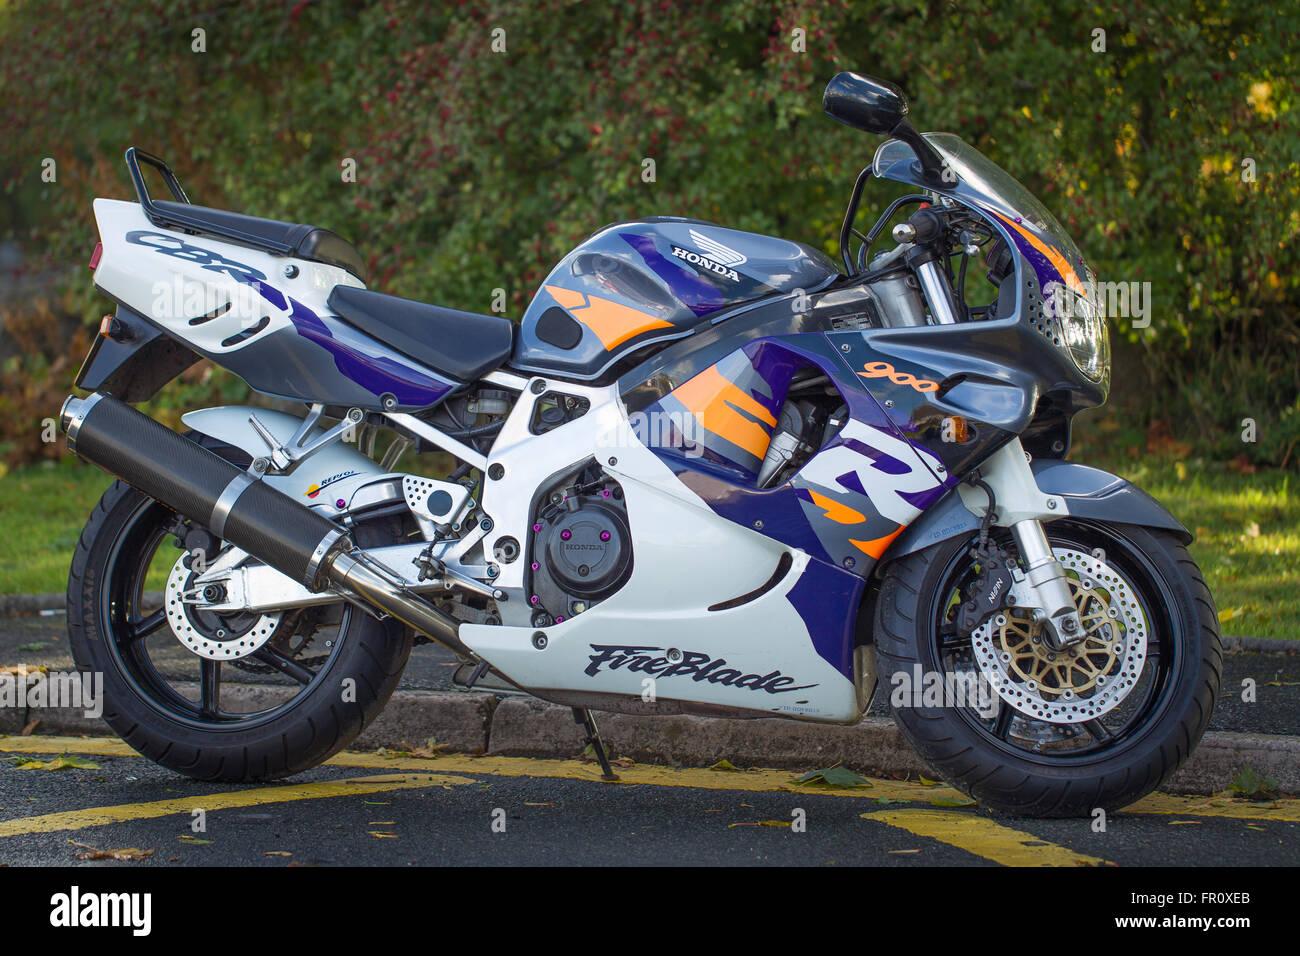 Fire blade  Honda motorcycle 900 RR . Color   White purple gray orange - Stock Image